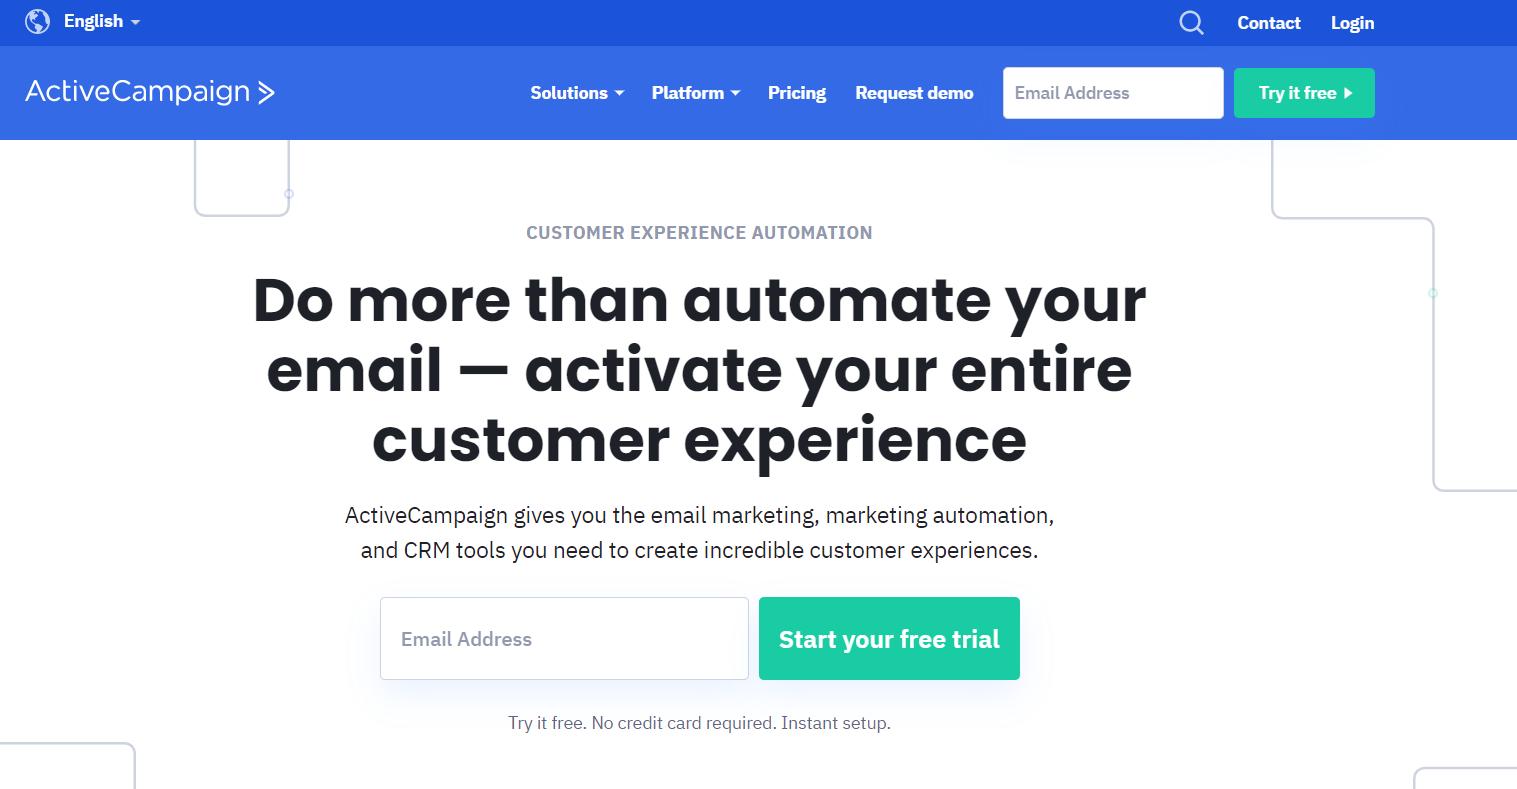 ActiveCampaign Marketing